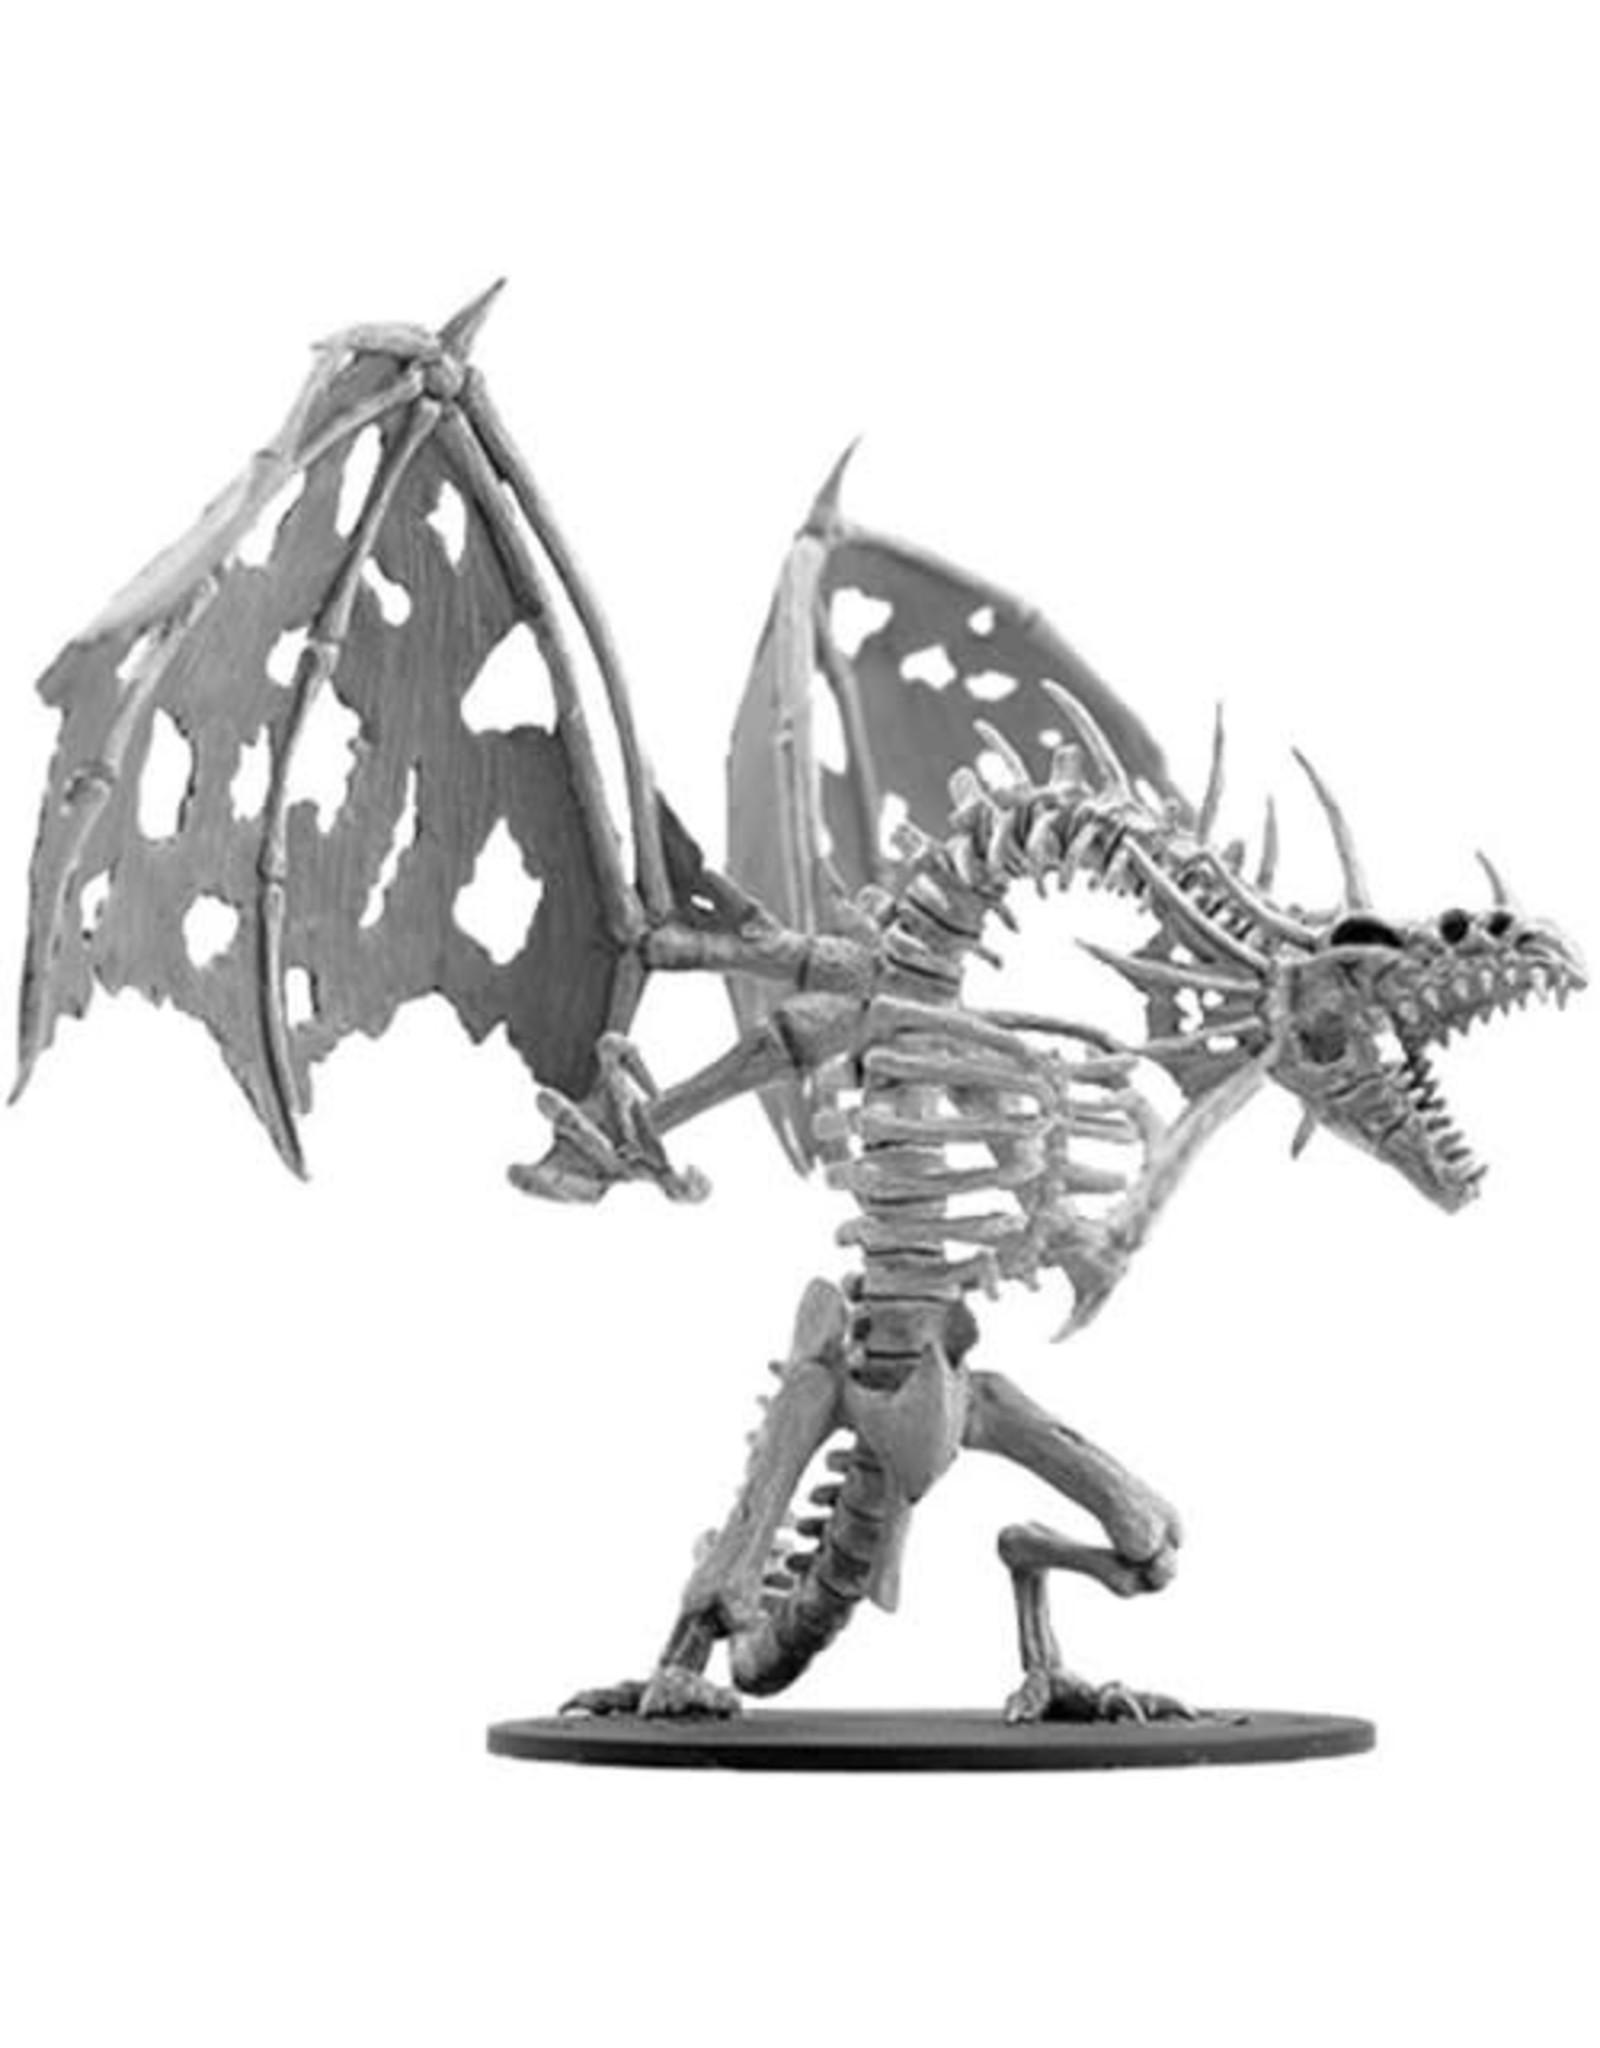 WizKids Pathfinder Deep Cuts Unpainted Miniatures: W11 Gargantuan Skeletal Dragon